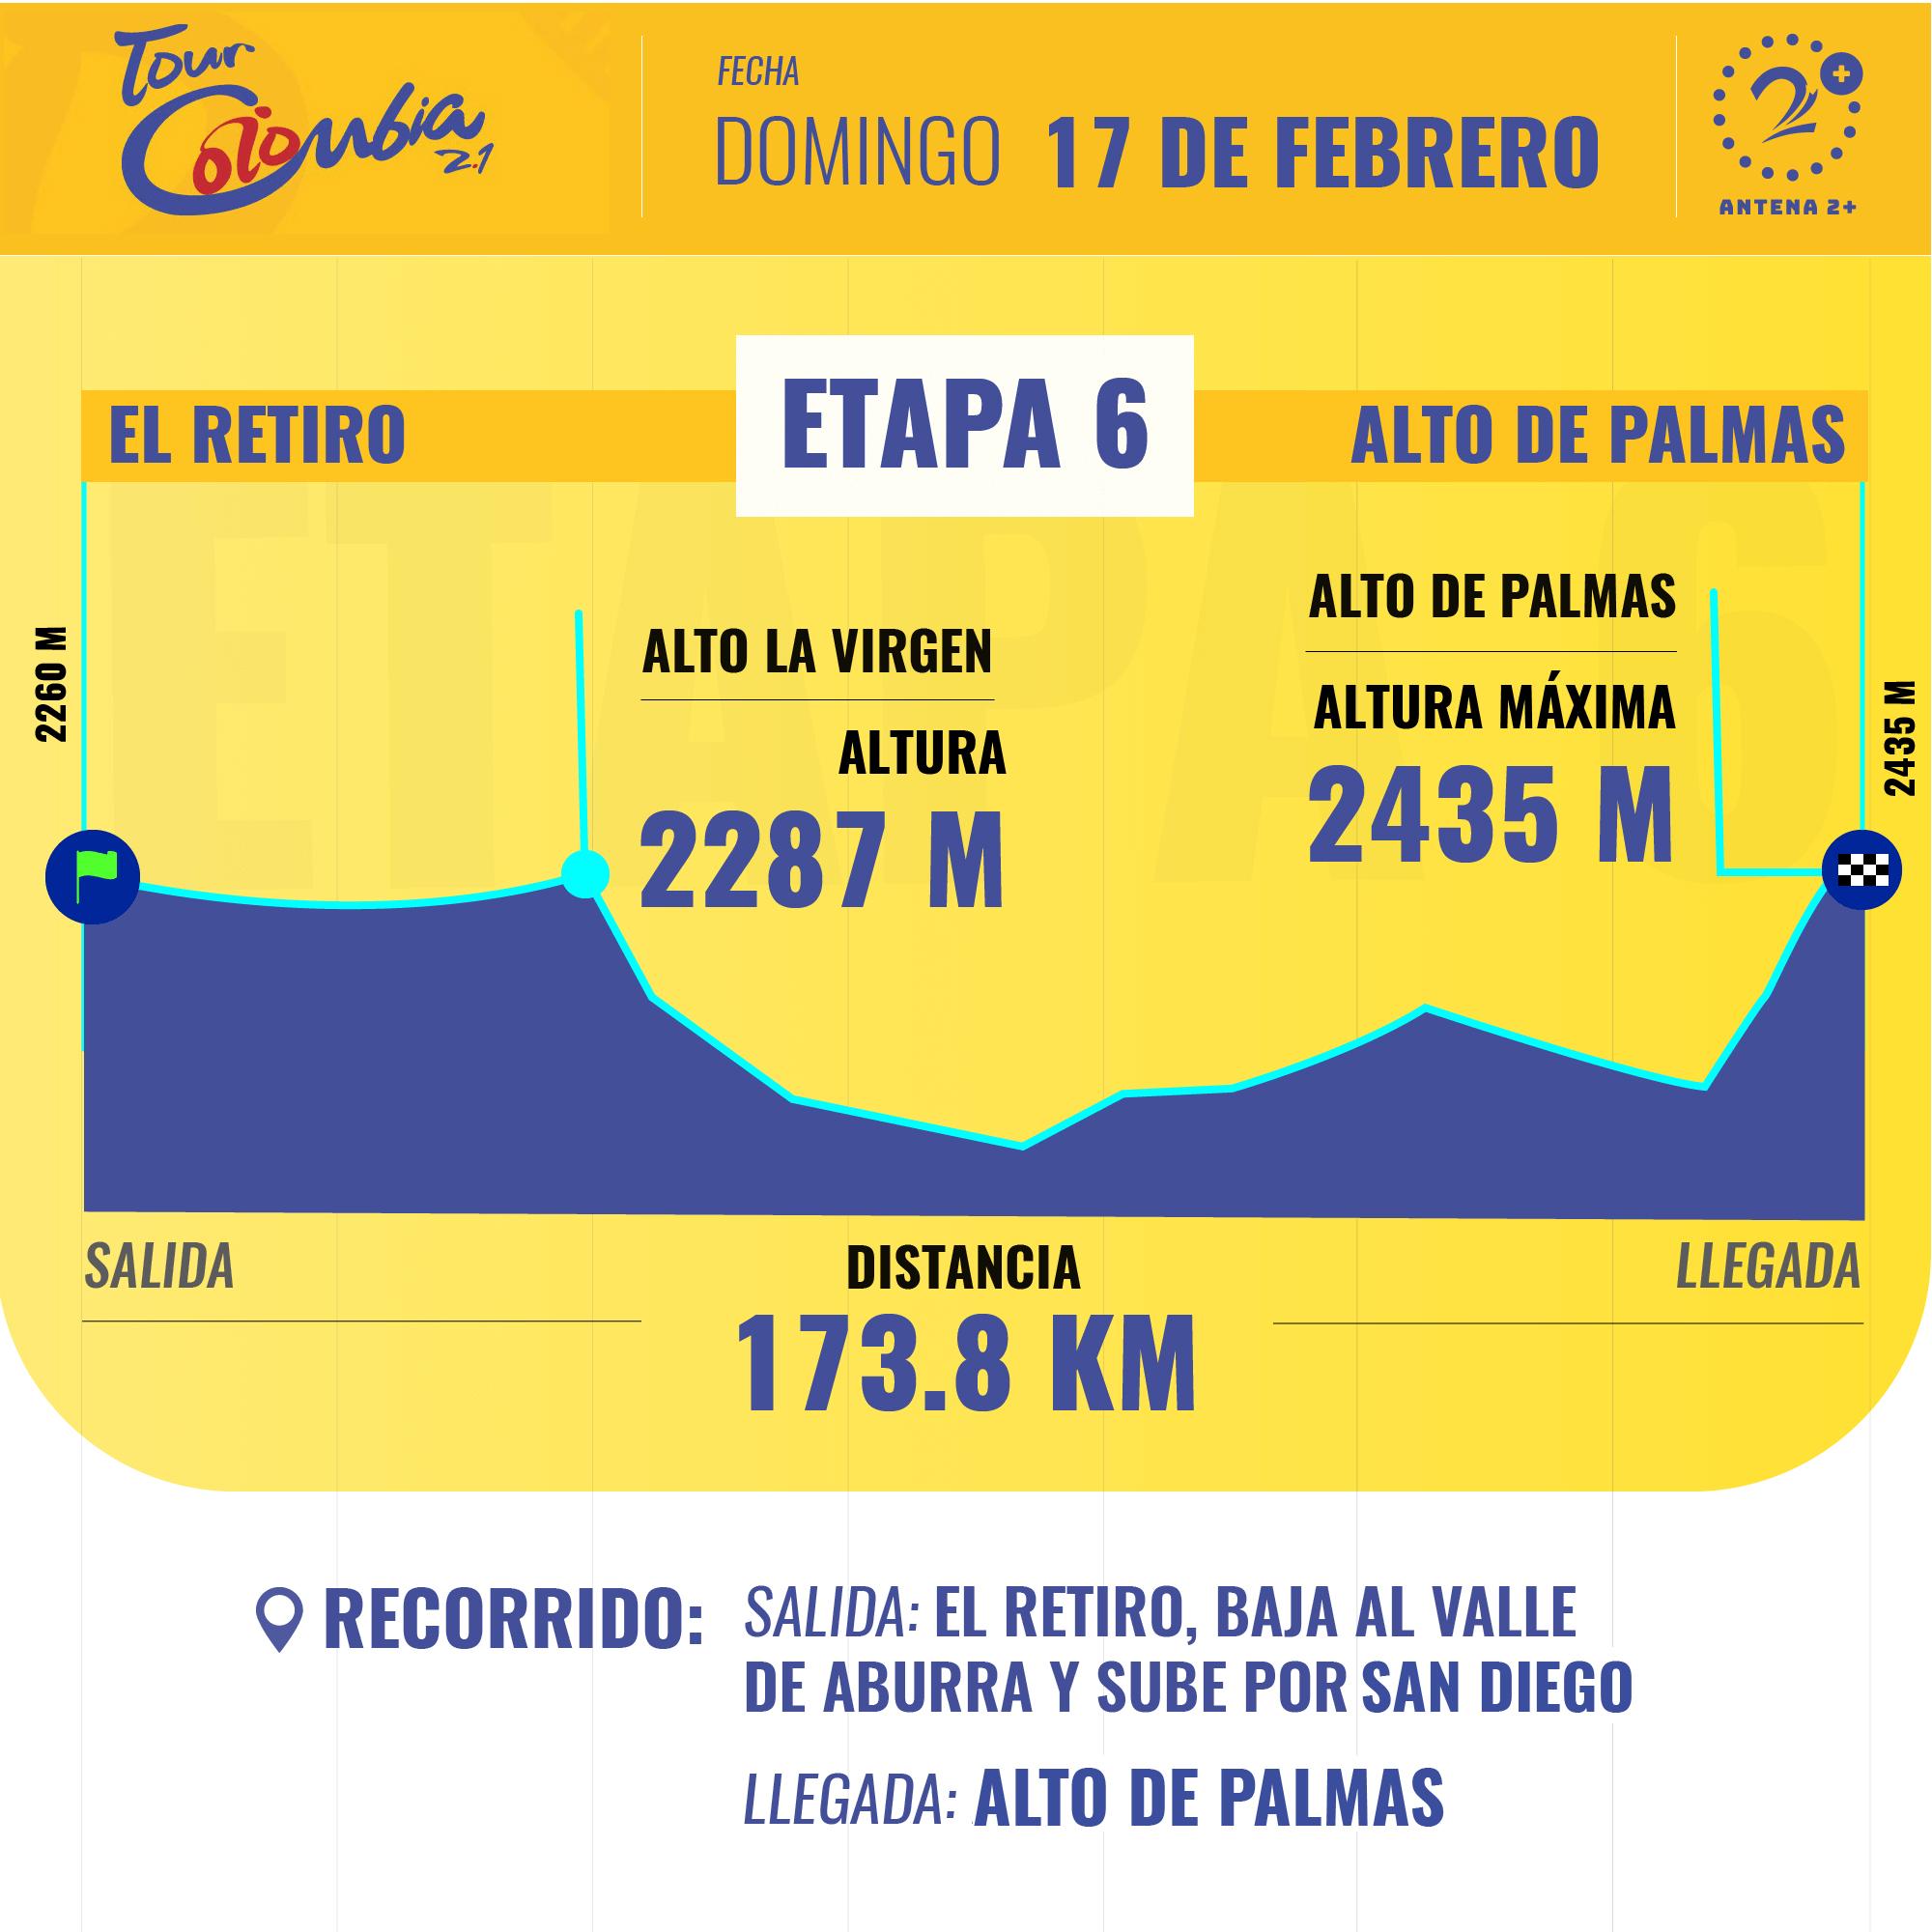 Así será la sexta etapa del Tour Colombia 2019